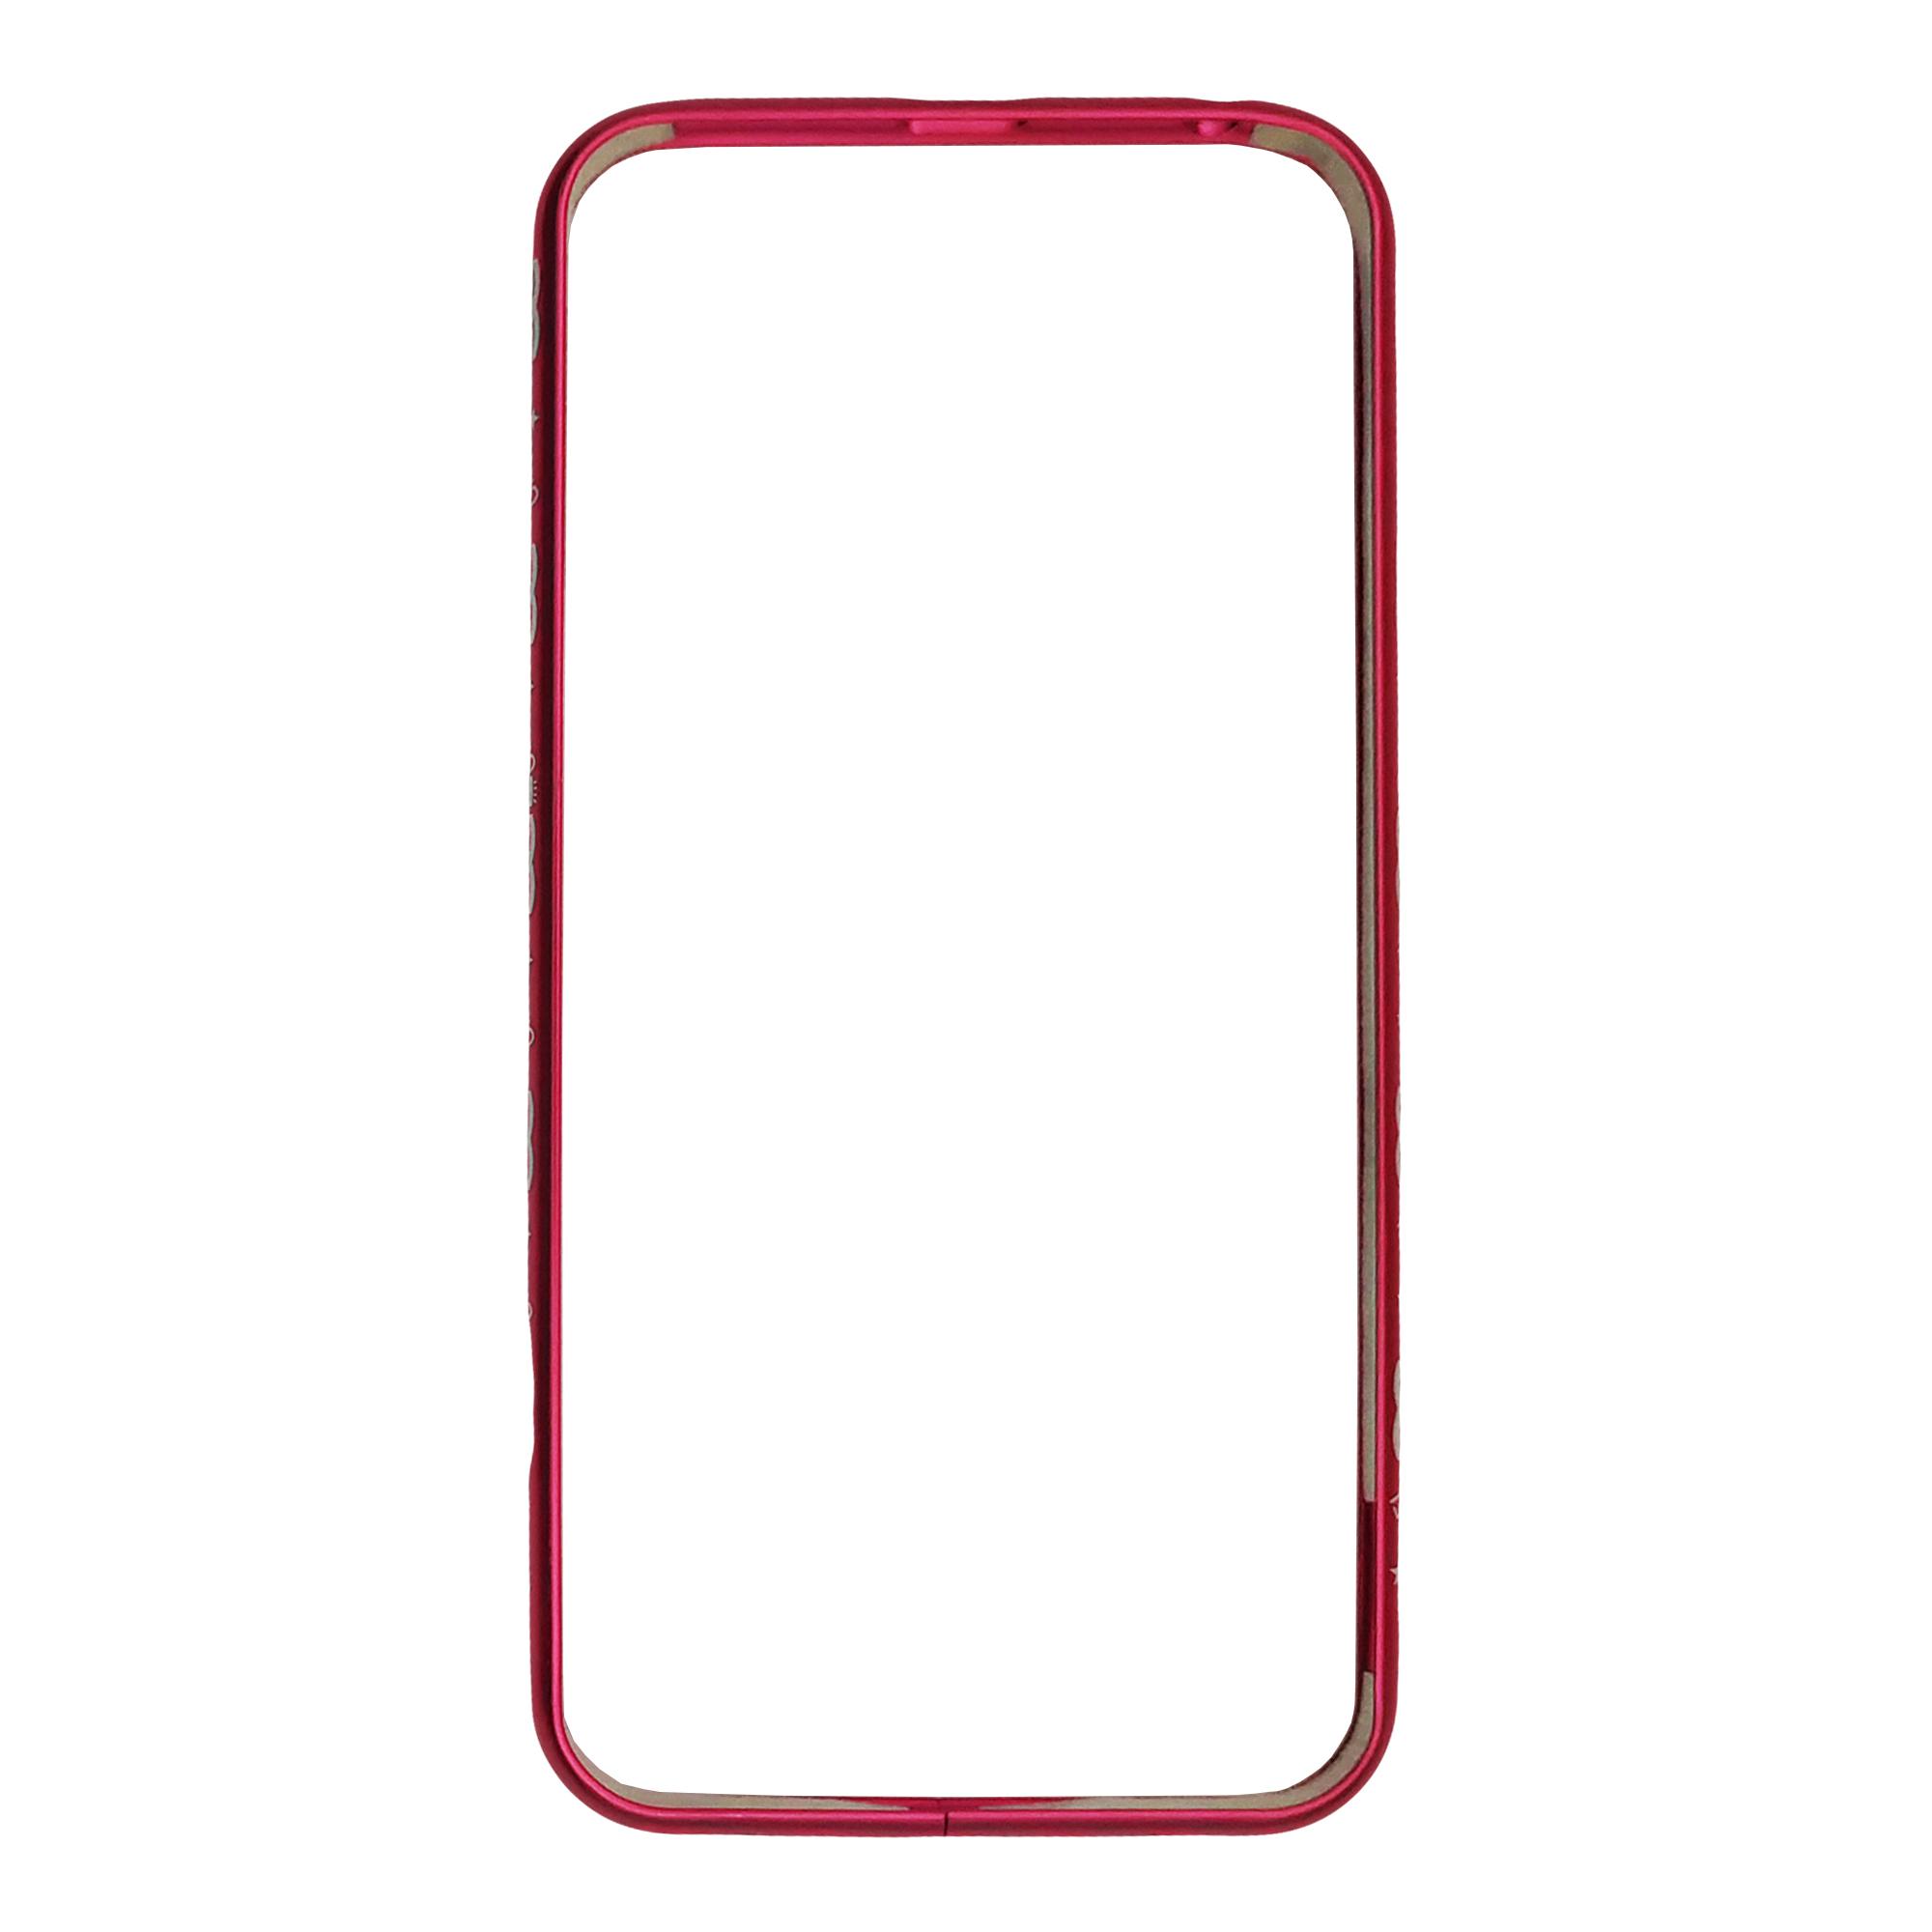 بامپر کد Mc-27 مناسب برای گوشی موبایل اپل iPhone 6 / 6S